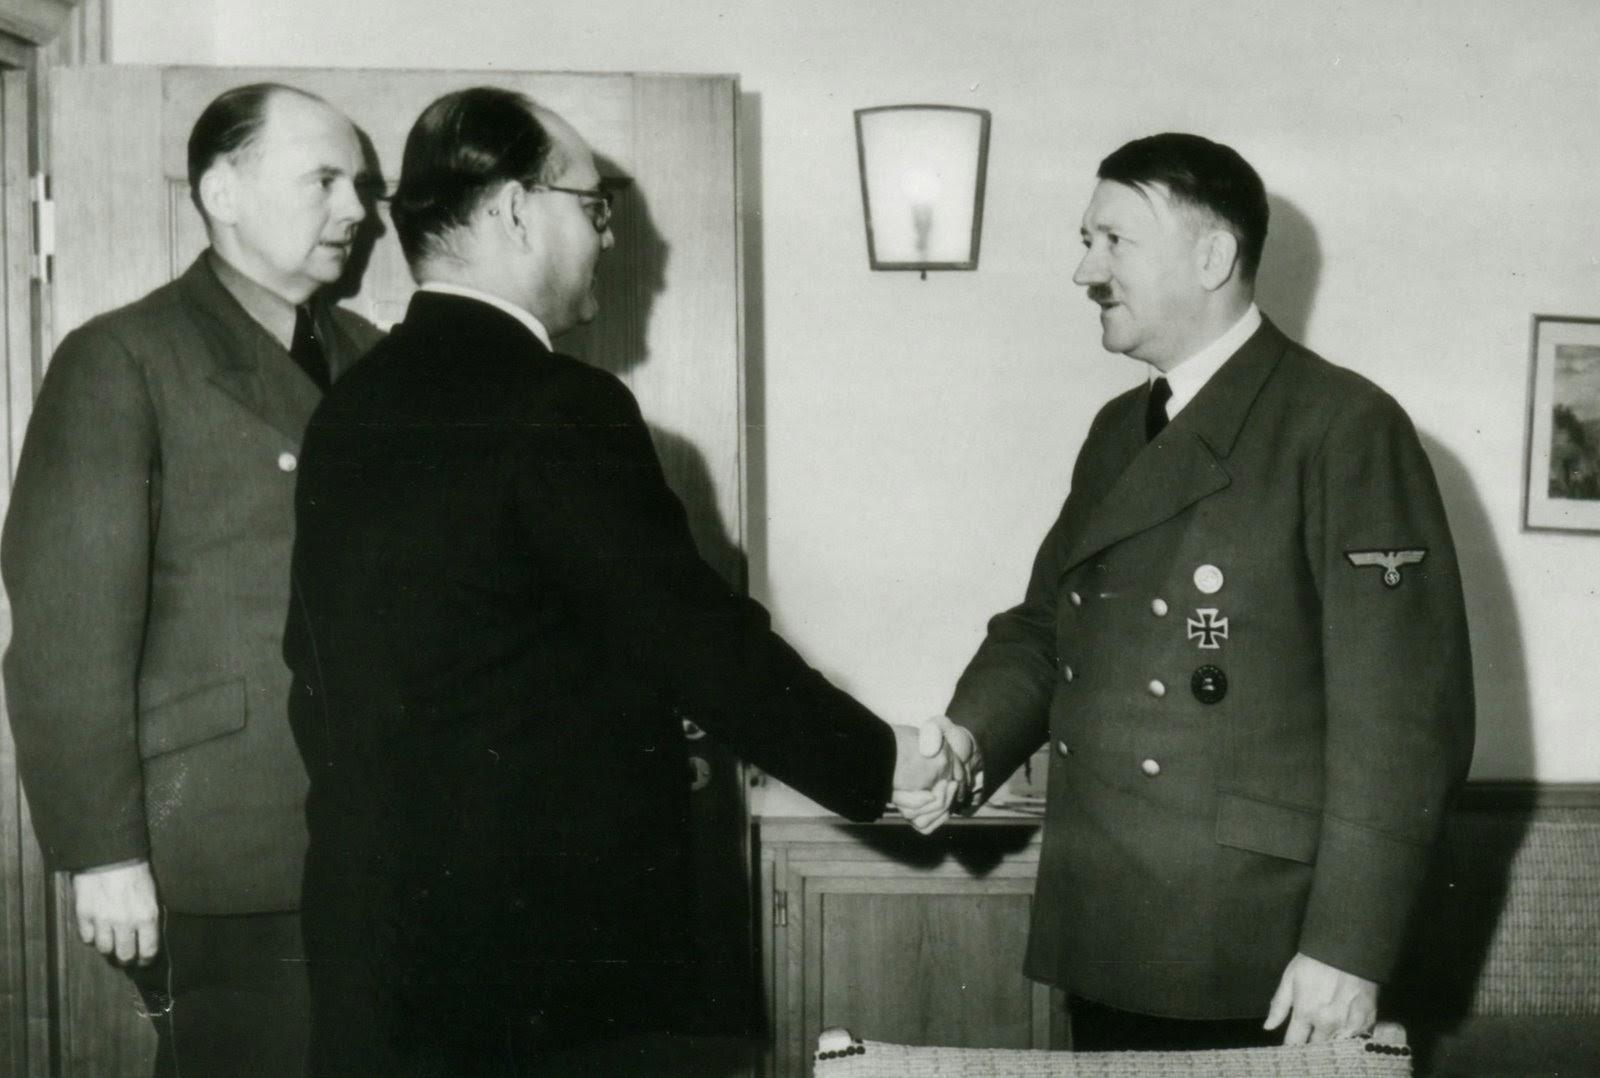 Subash Chandra Bose with Adolf Hitler